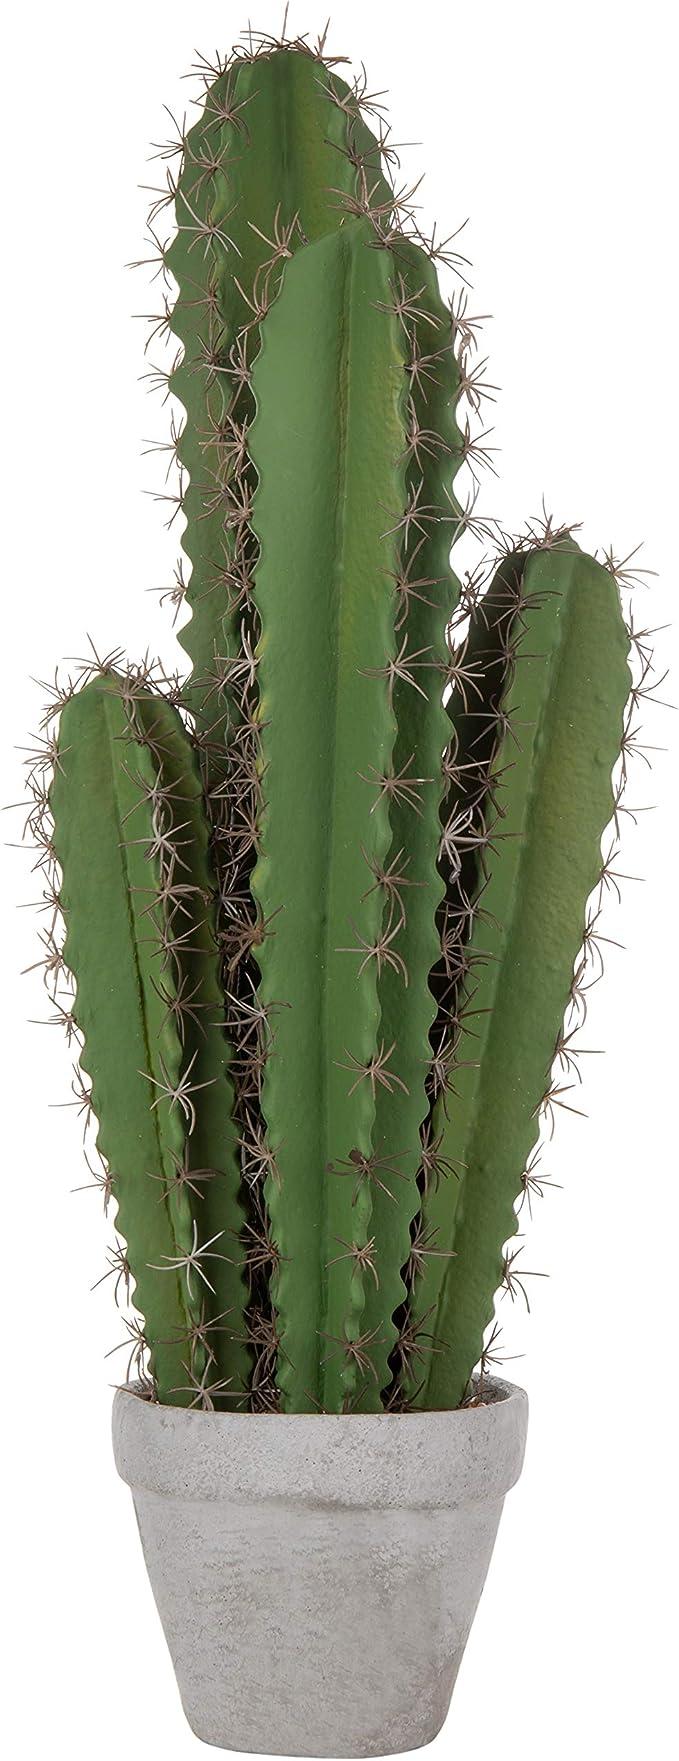 Plantas artificiales de cactushttps://amzn.to/2OrksKH